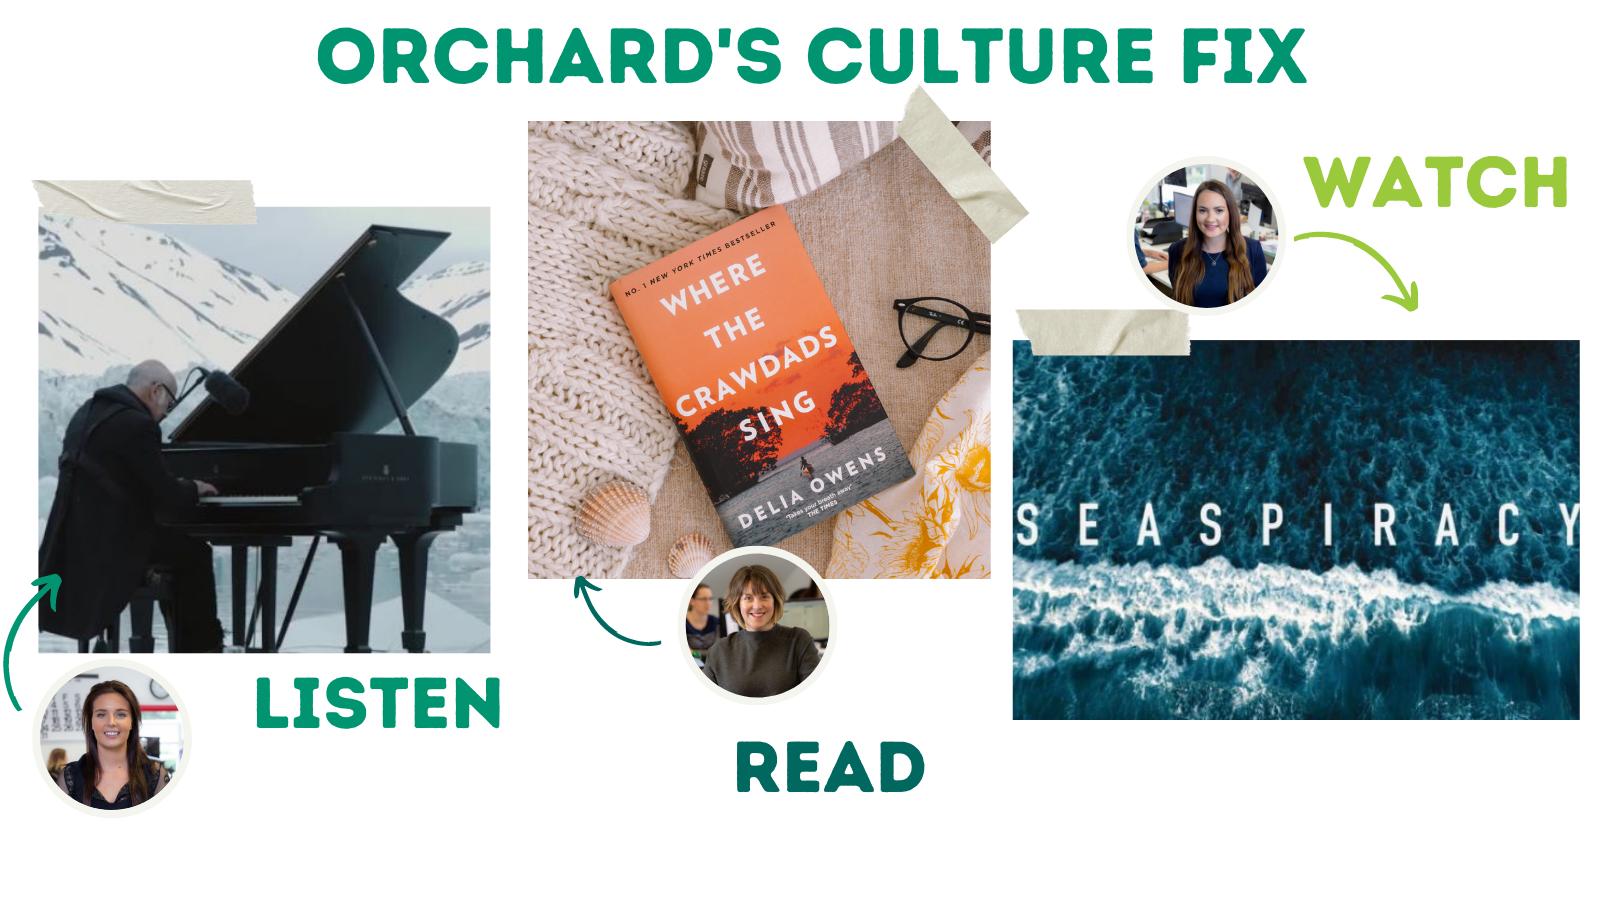 Orchard's culture fix #4